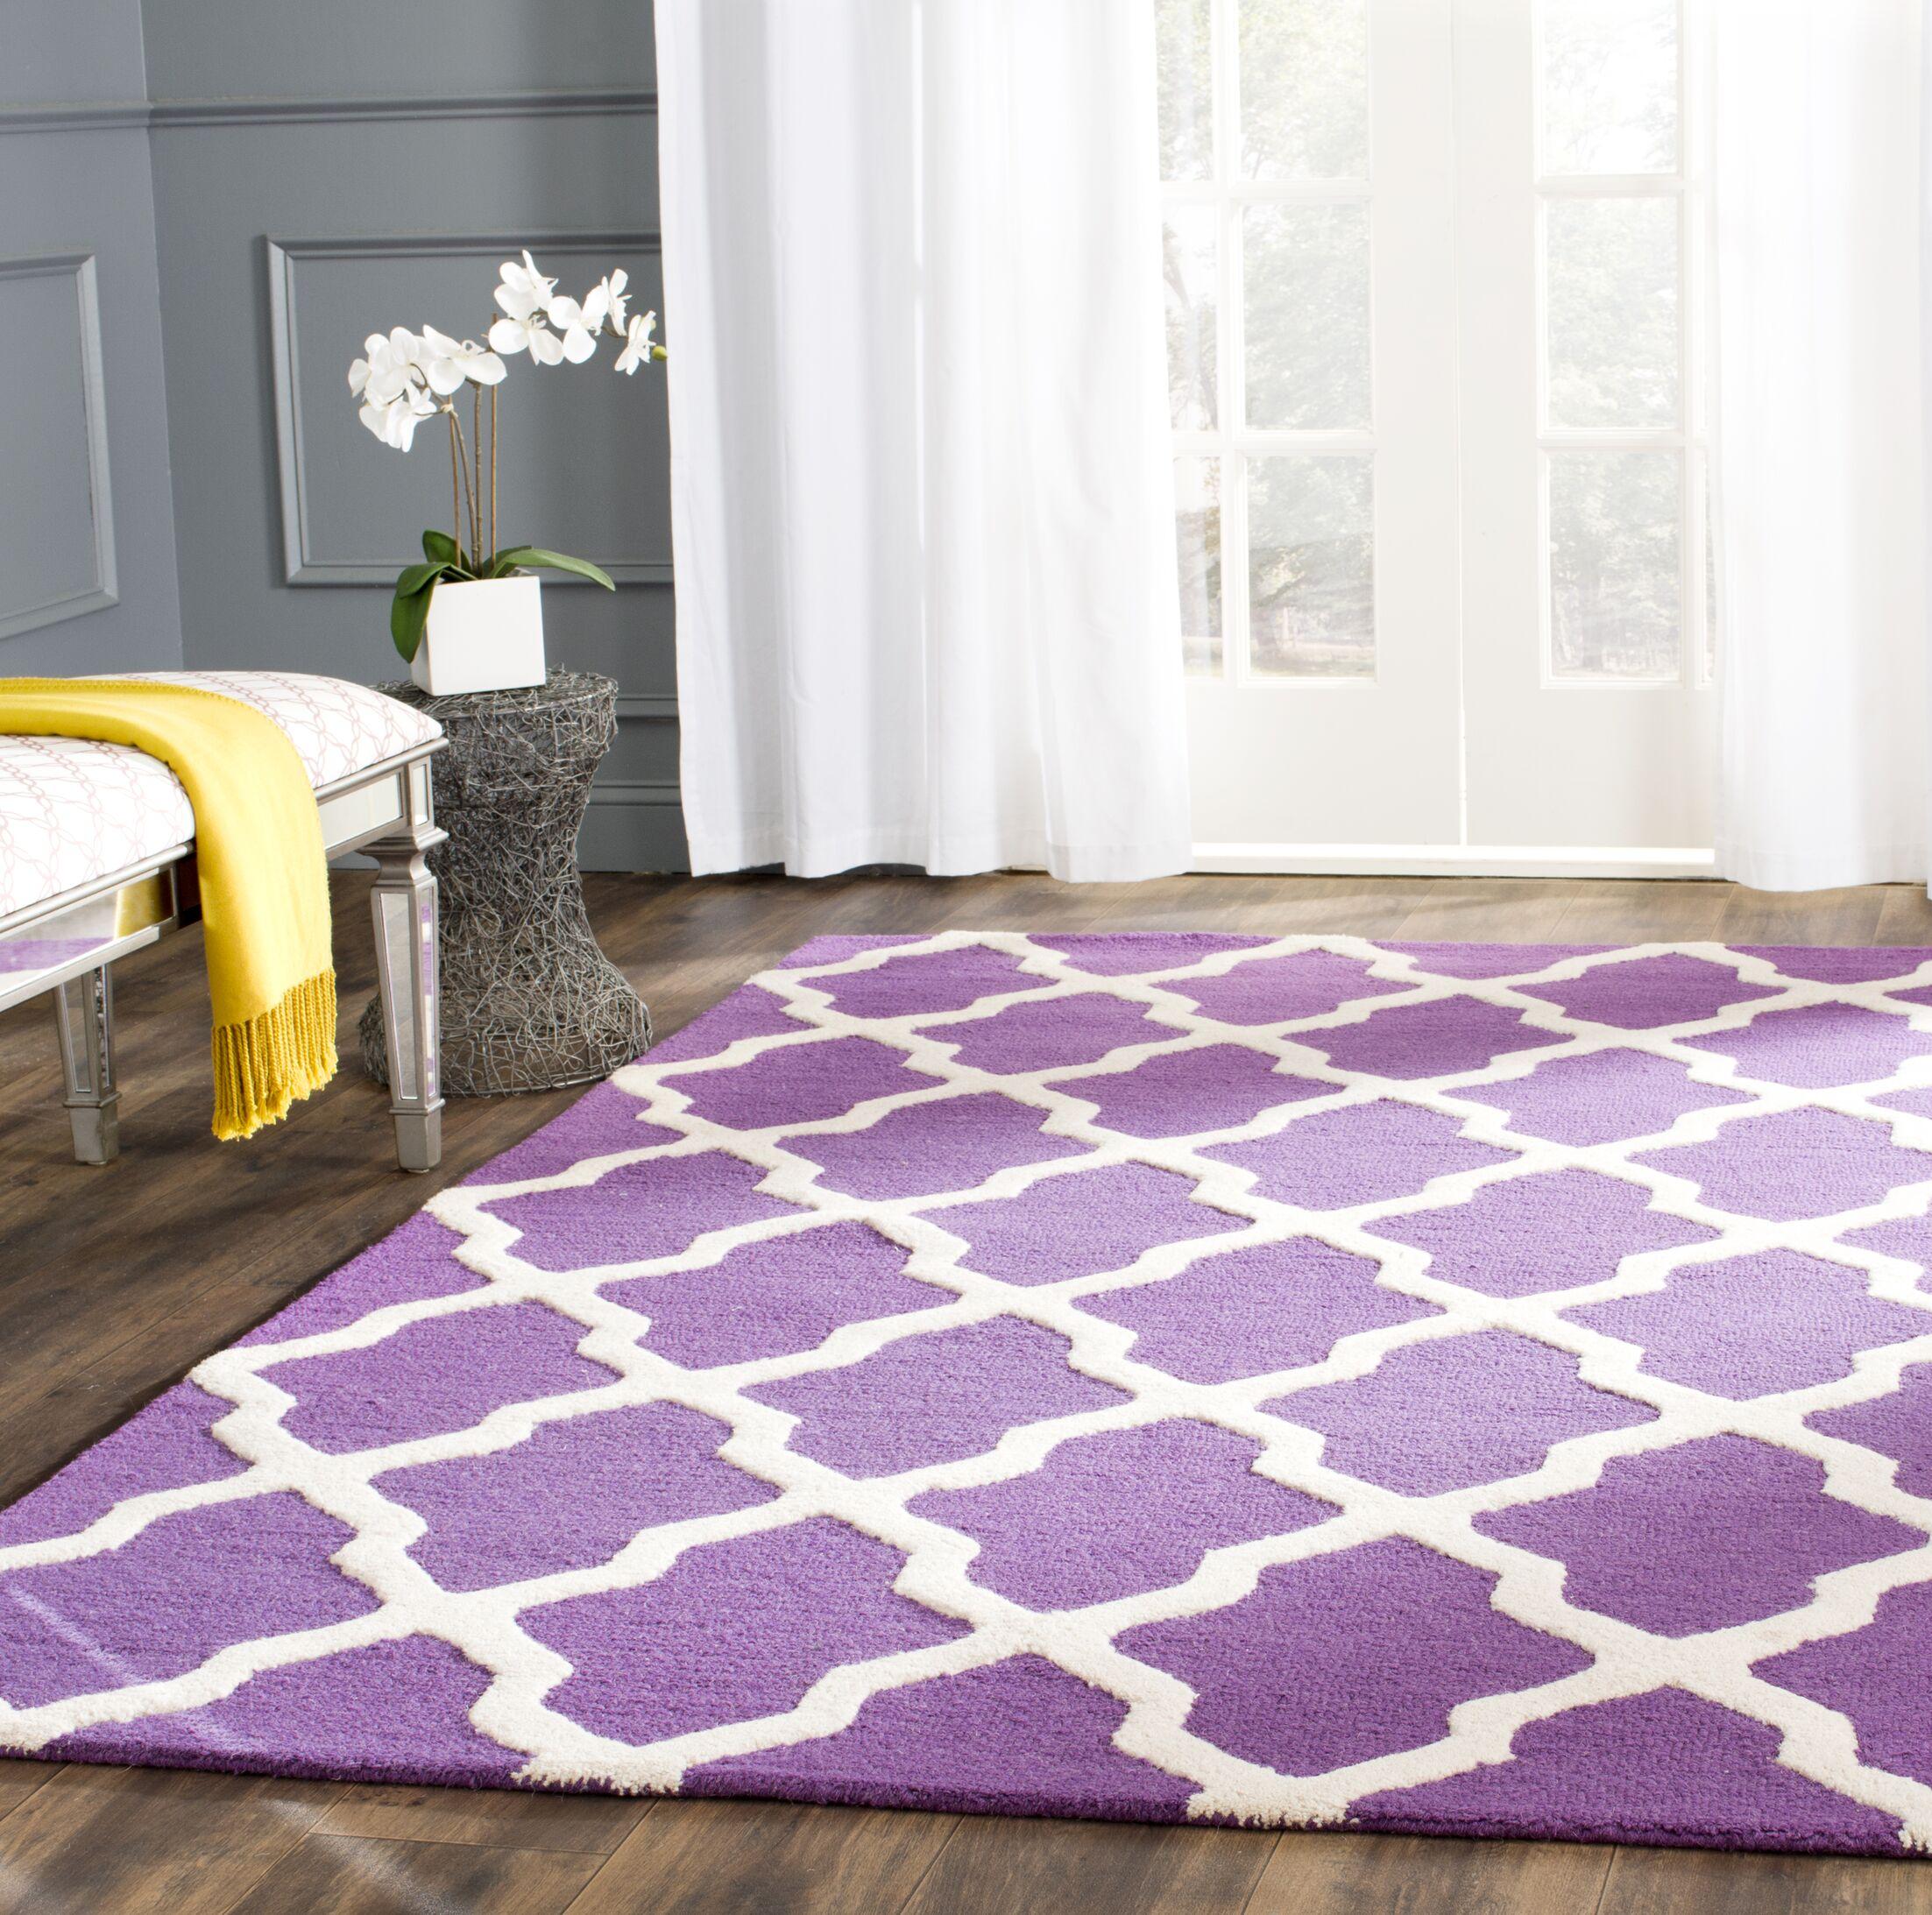 Charlenne Hand-Tufted Purple/Ivory Area Rug Rug Size: Rectangle 5' x 8'